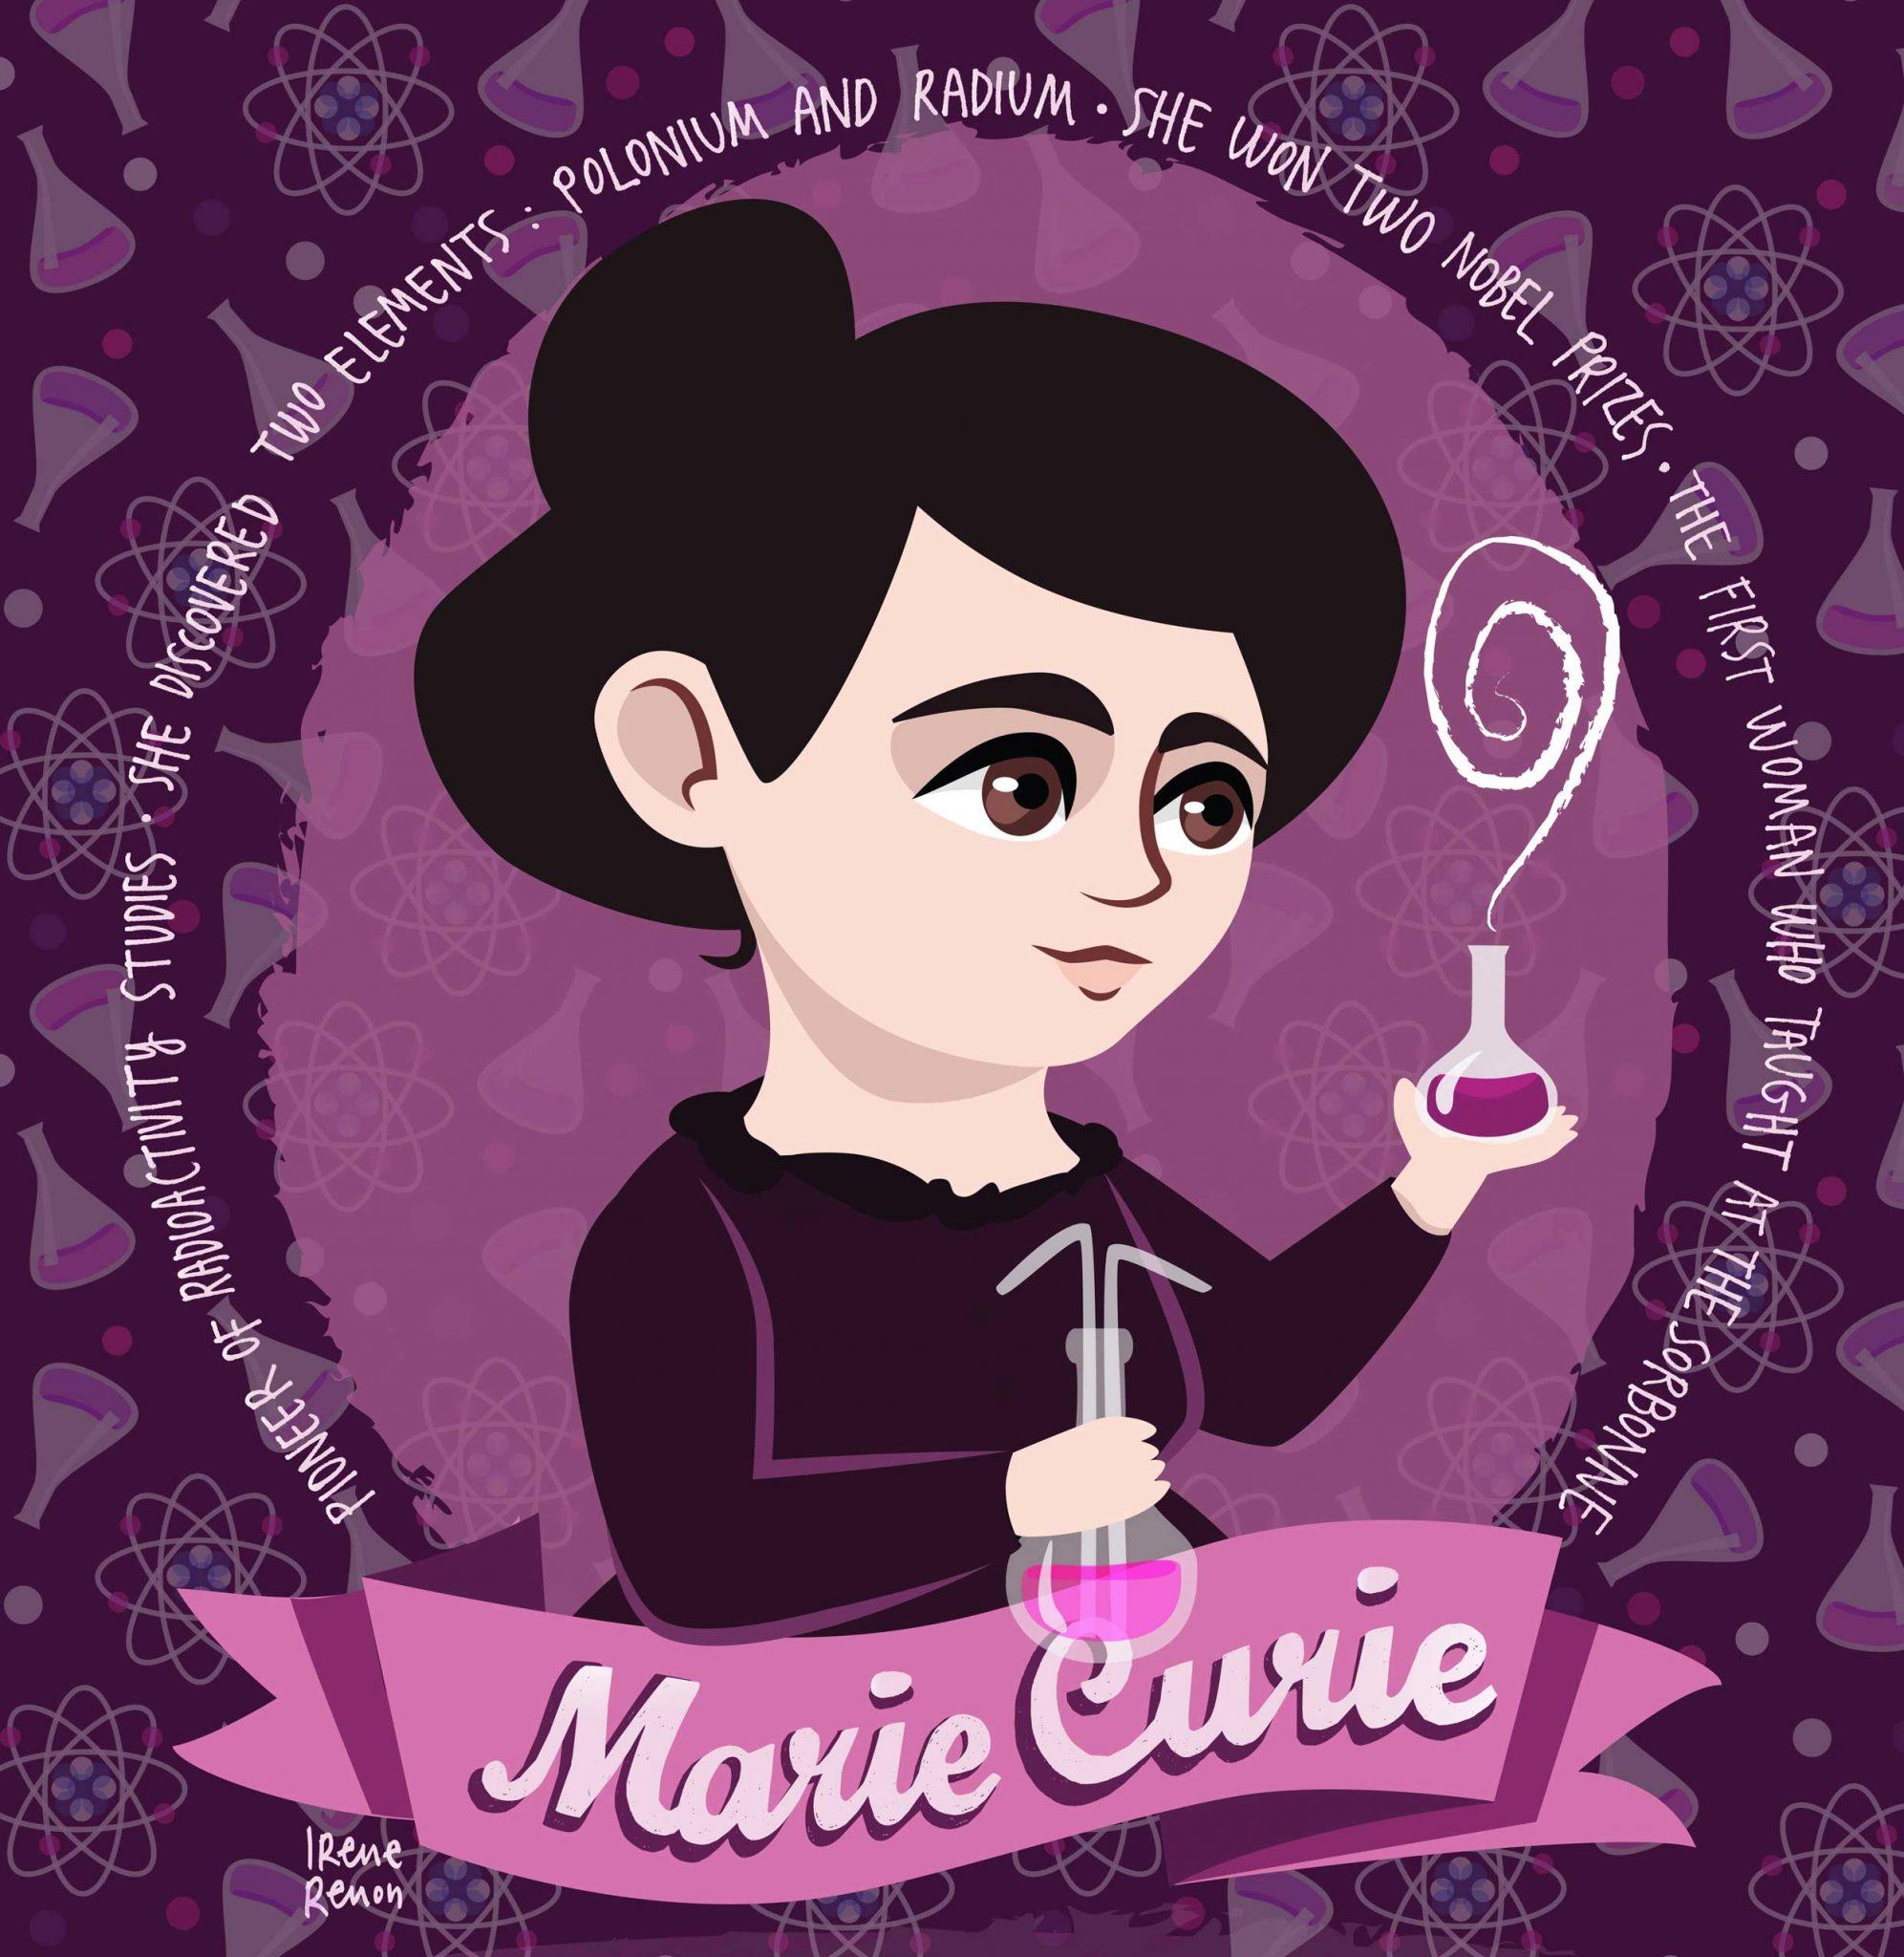 Marie Curie illiustration